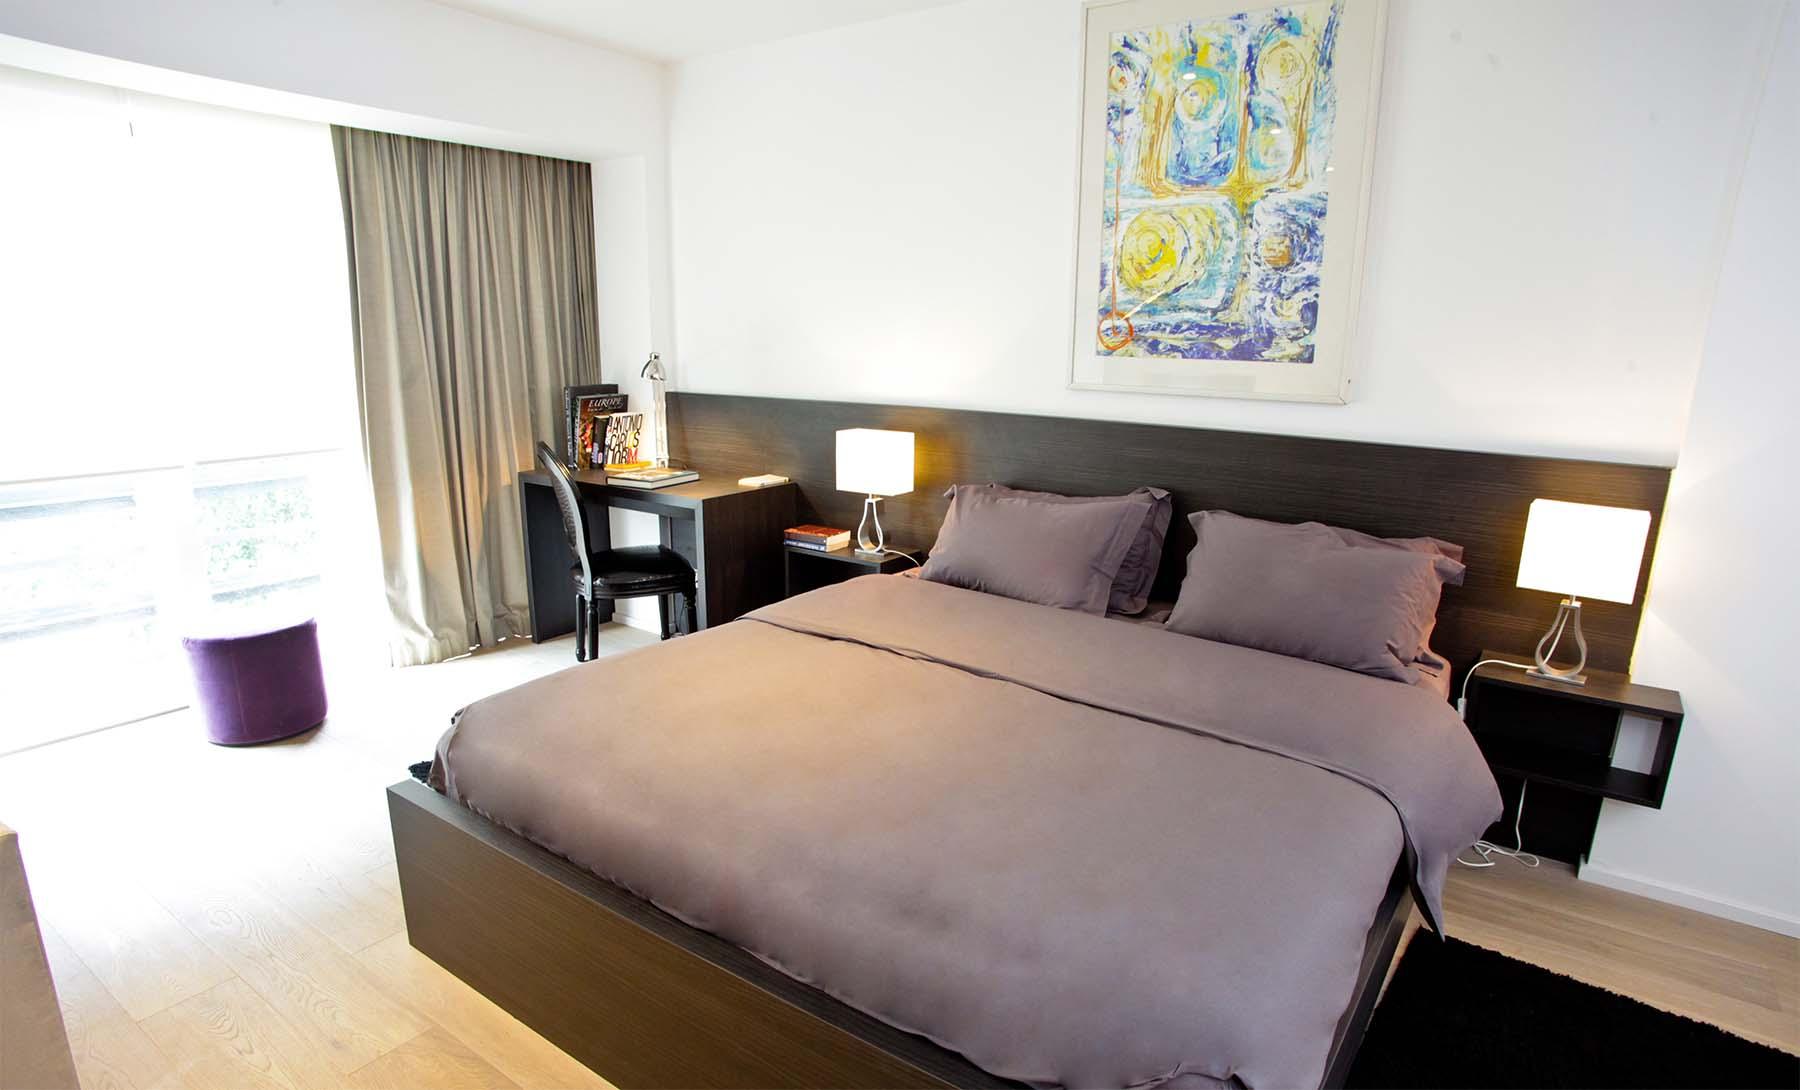 Appartment_0008_flat-brugmann-room.jpg